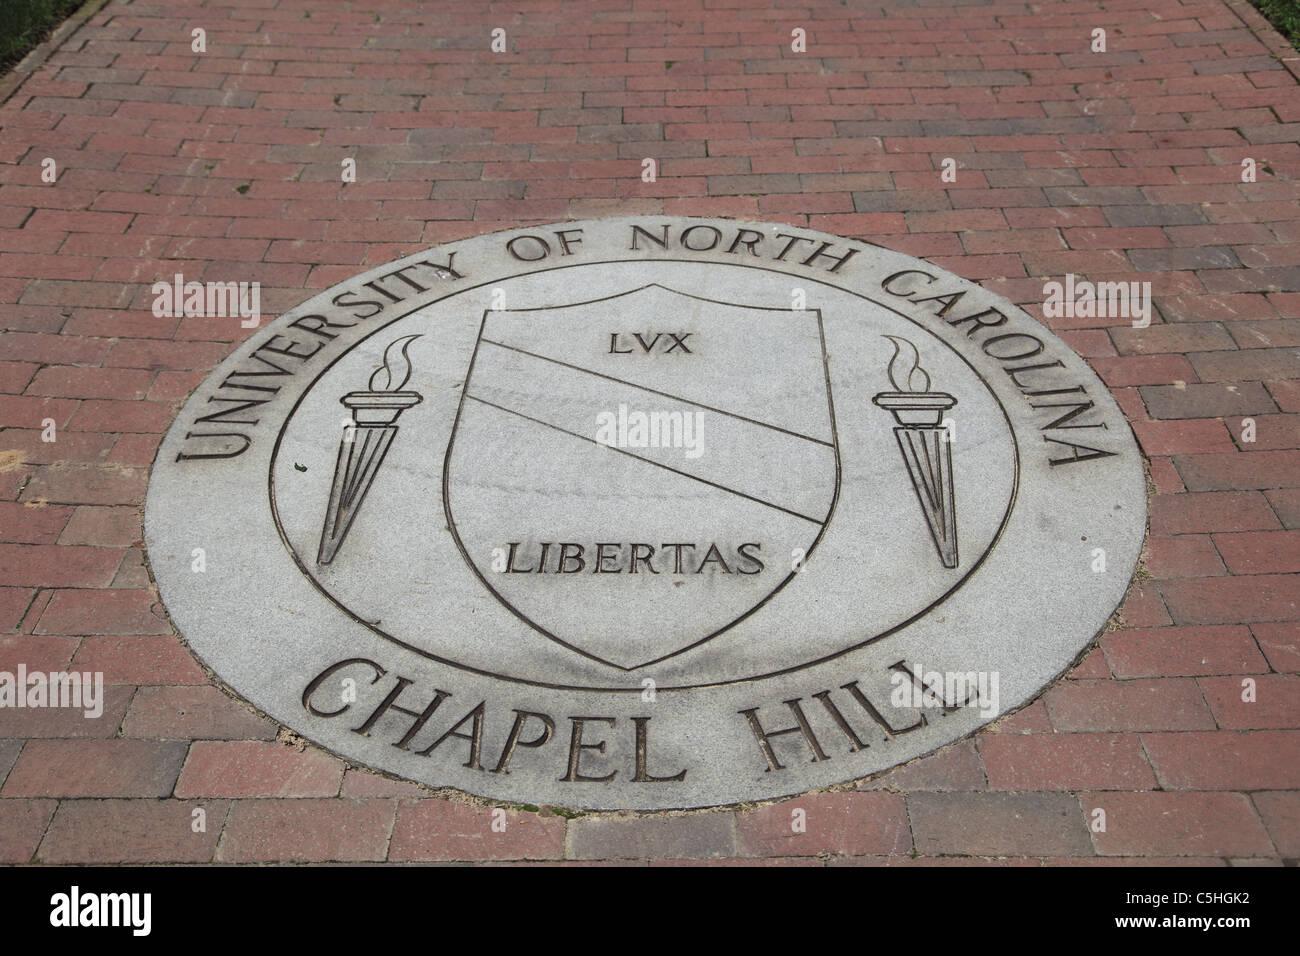 University of North Carolina, Chapel Hill, USA Stock Photo